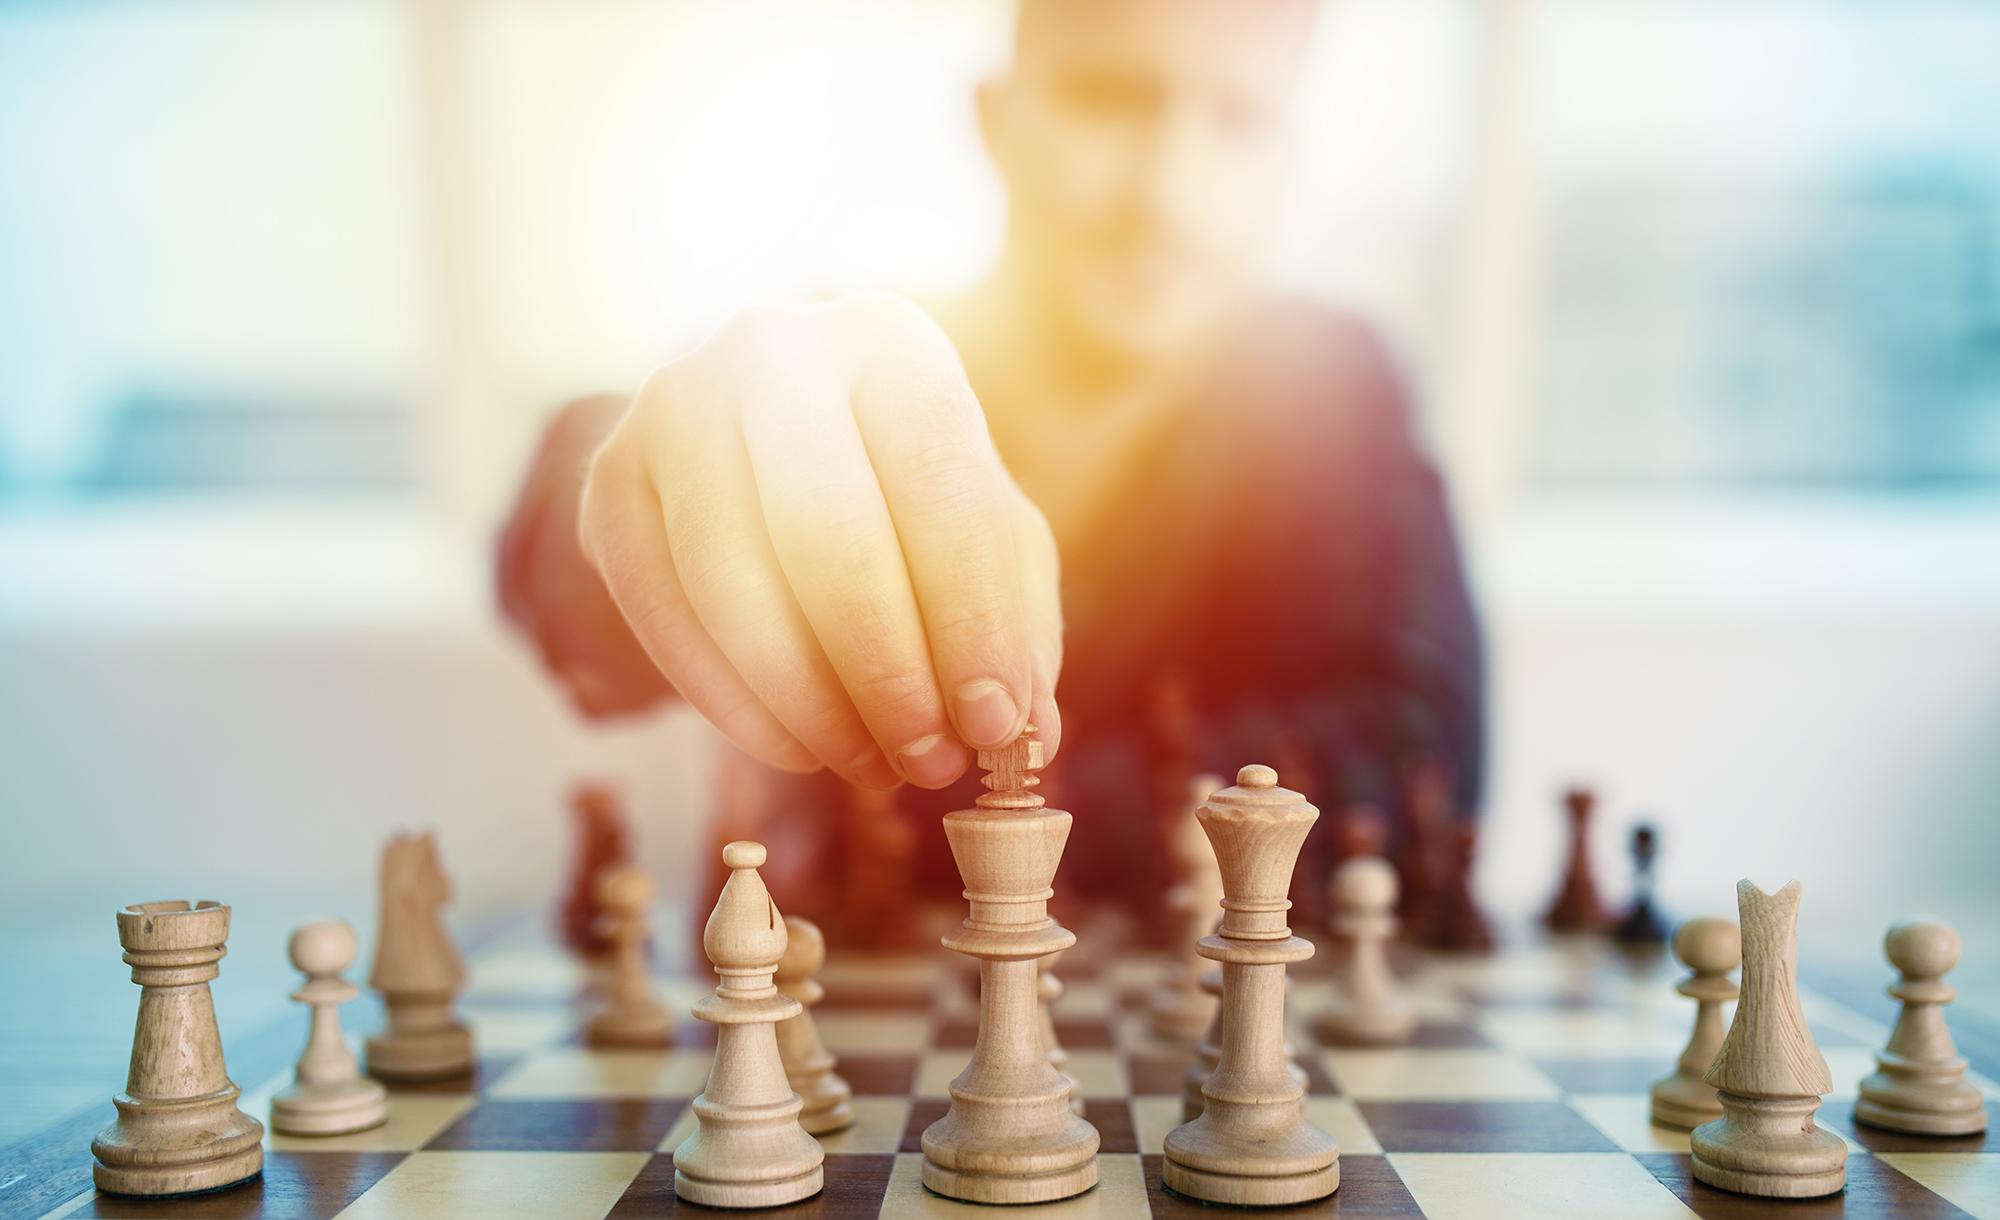 Man playing chess. (Image: Shutterstock)